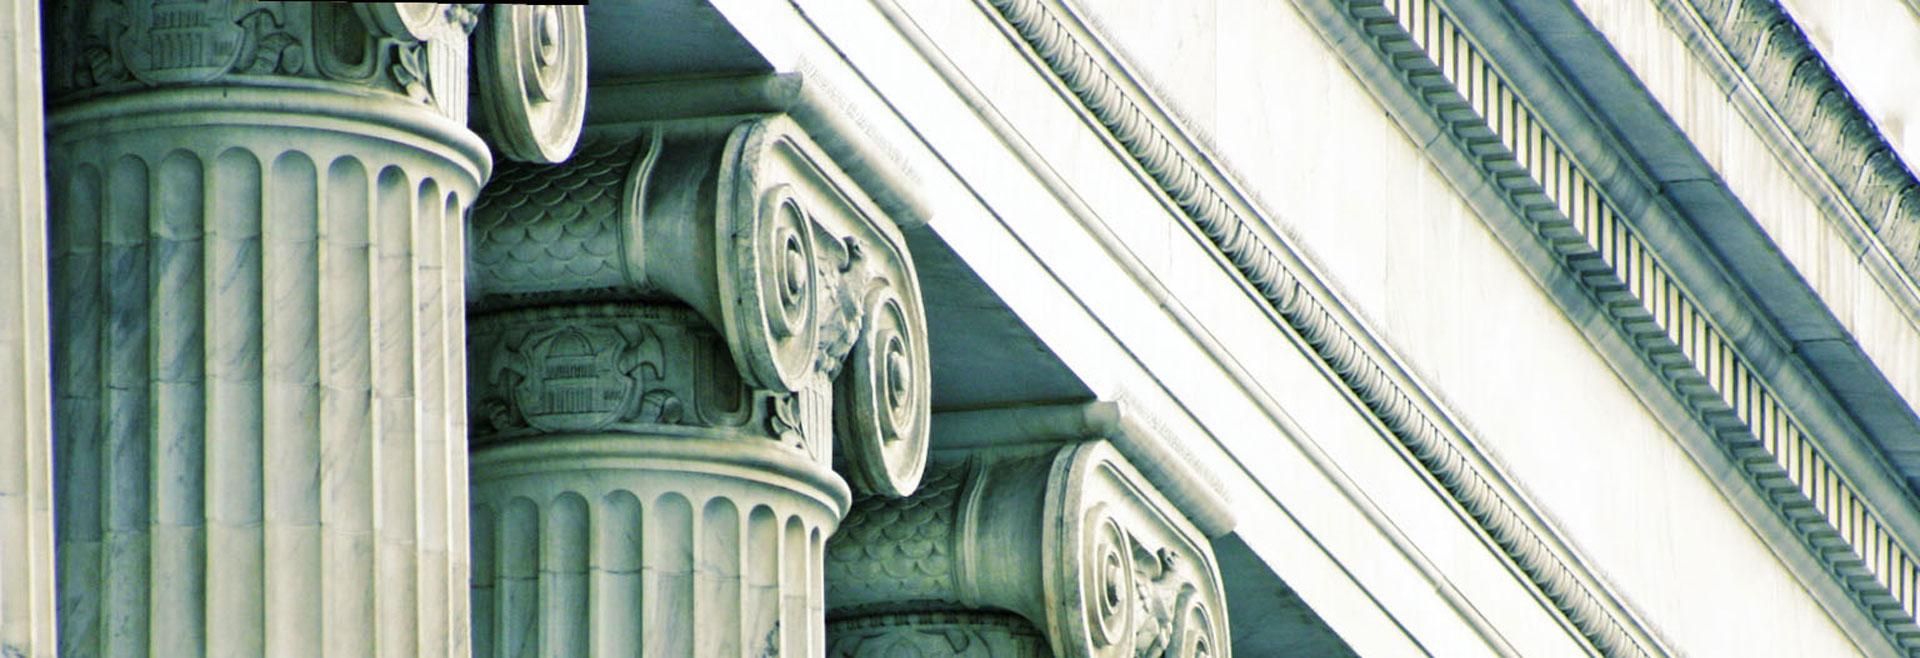 columns_1920x657